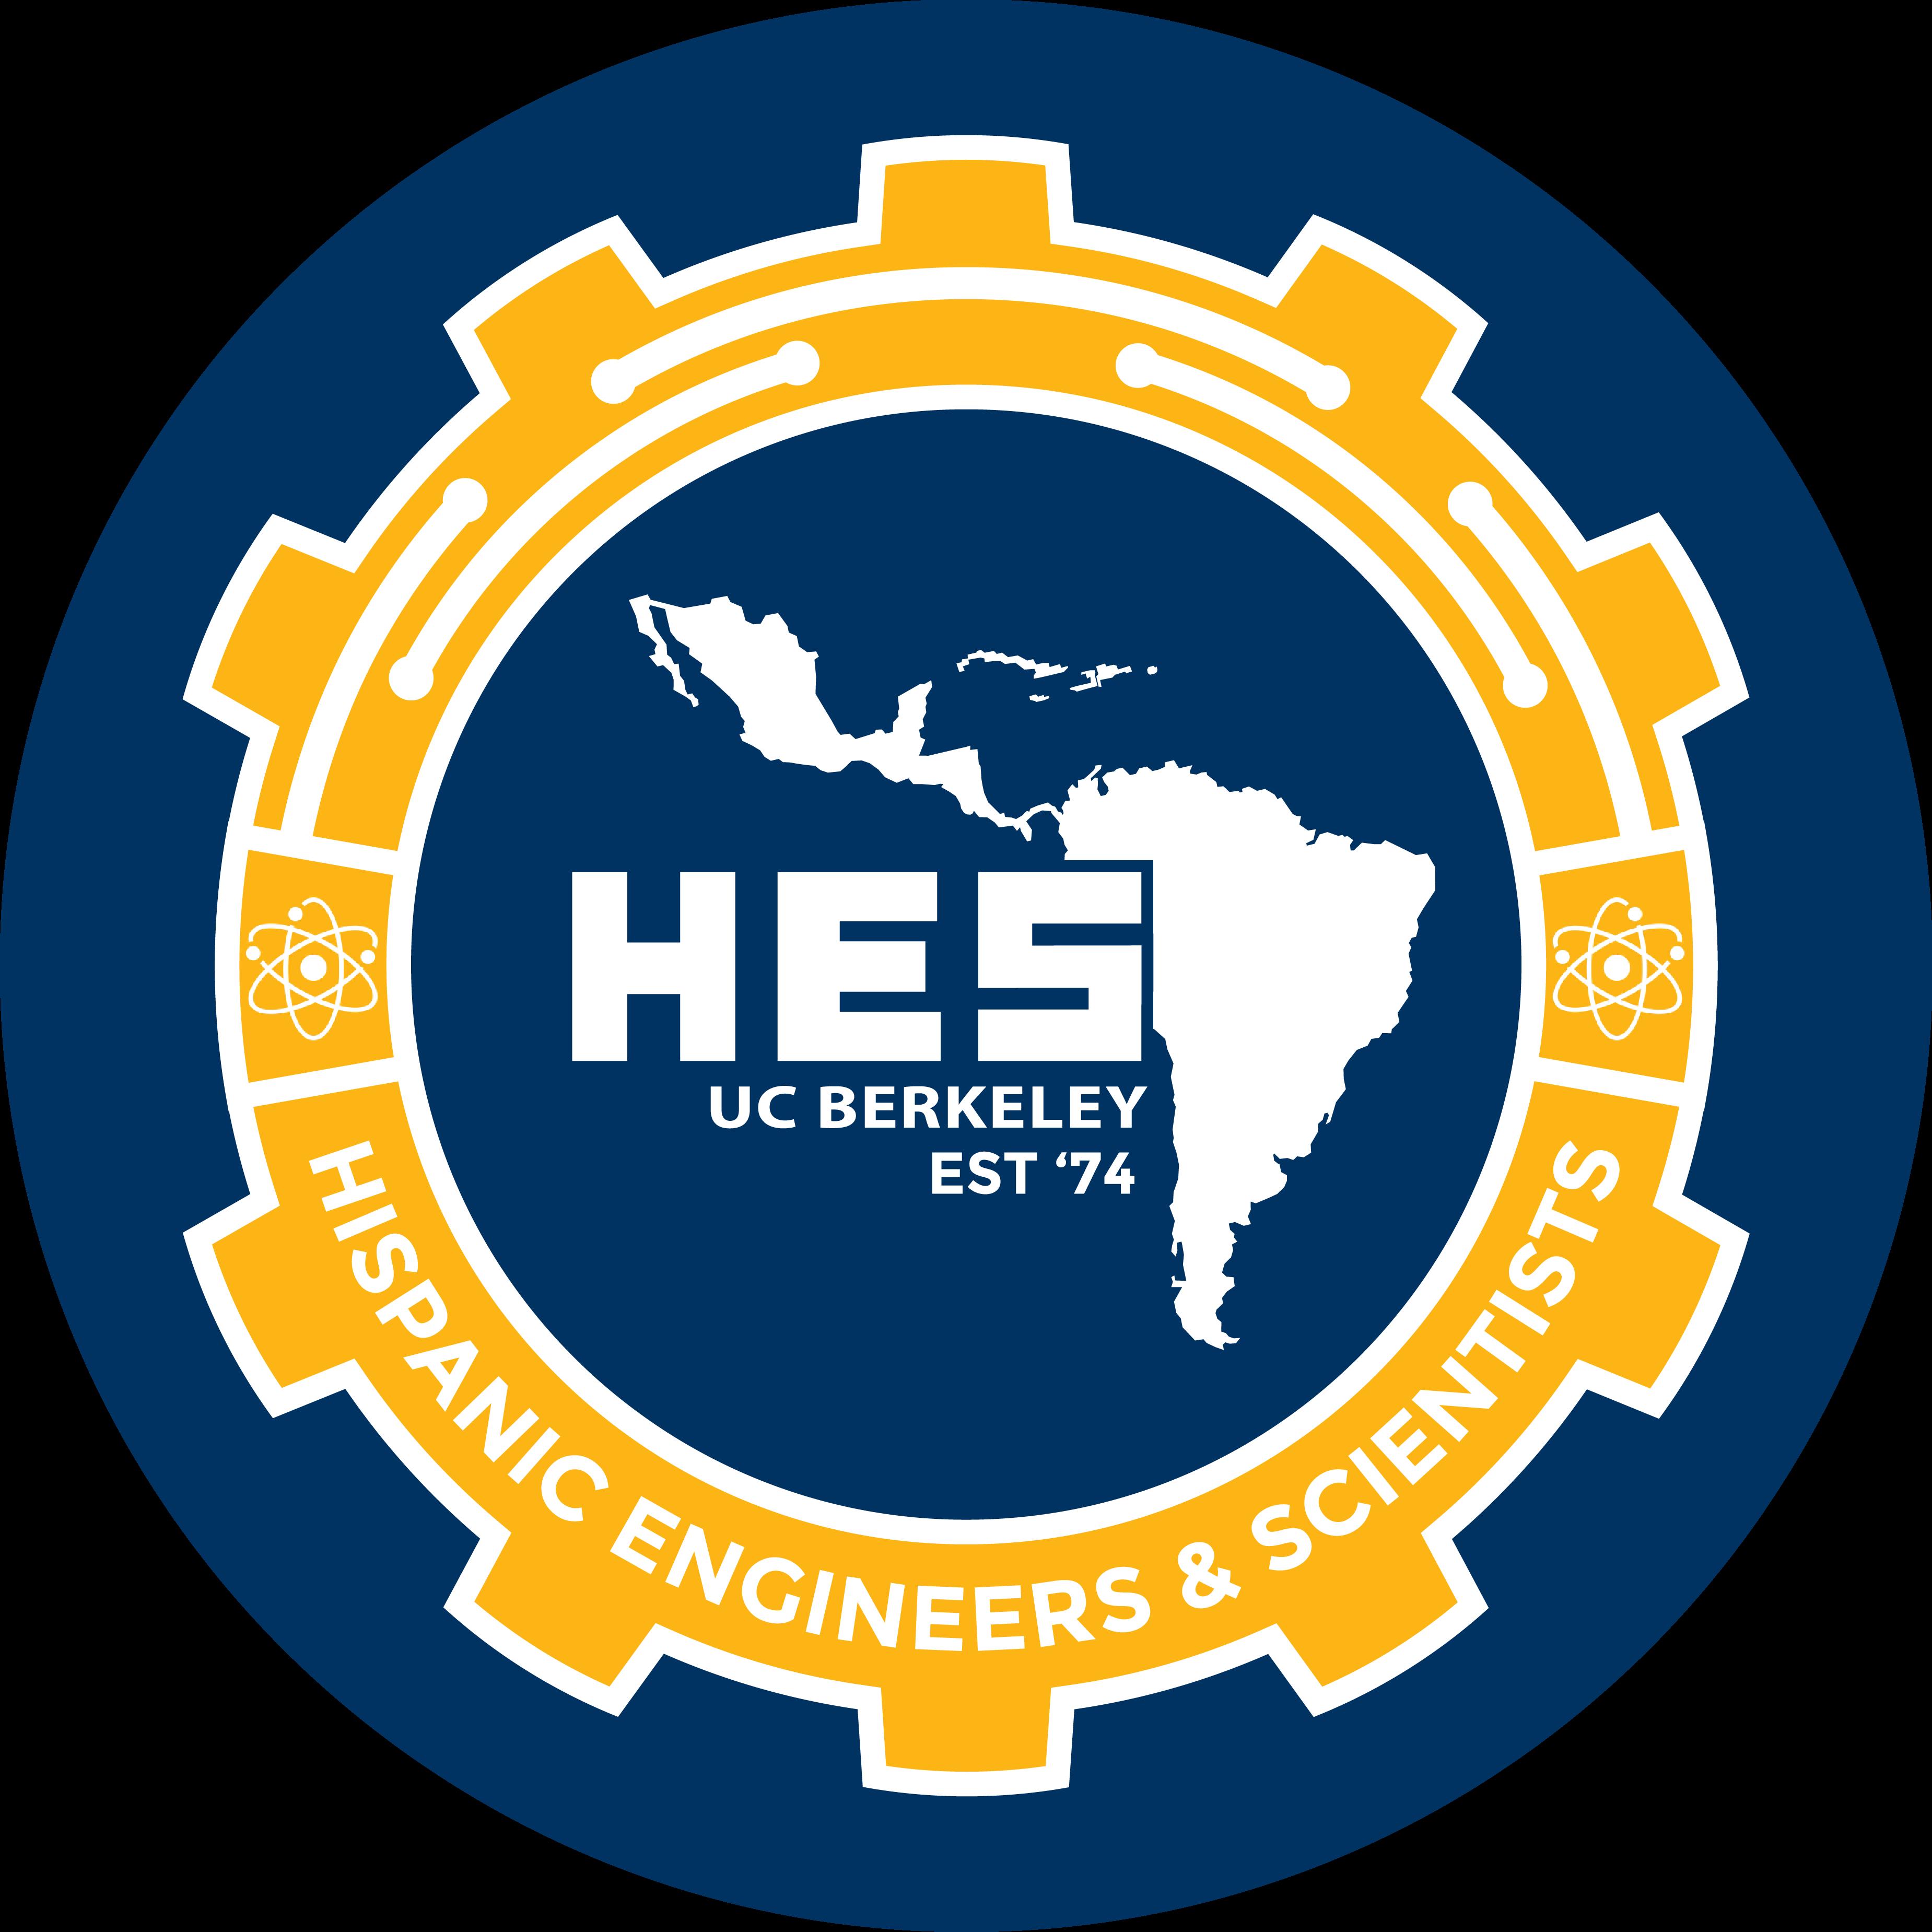 Hispanic Engineers and Scientists